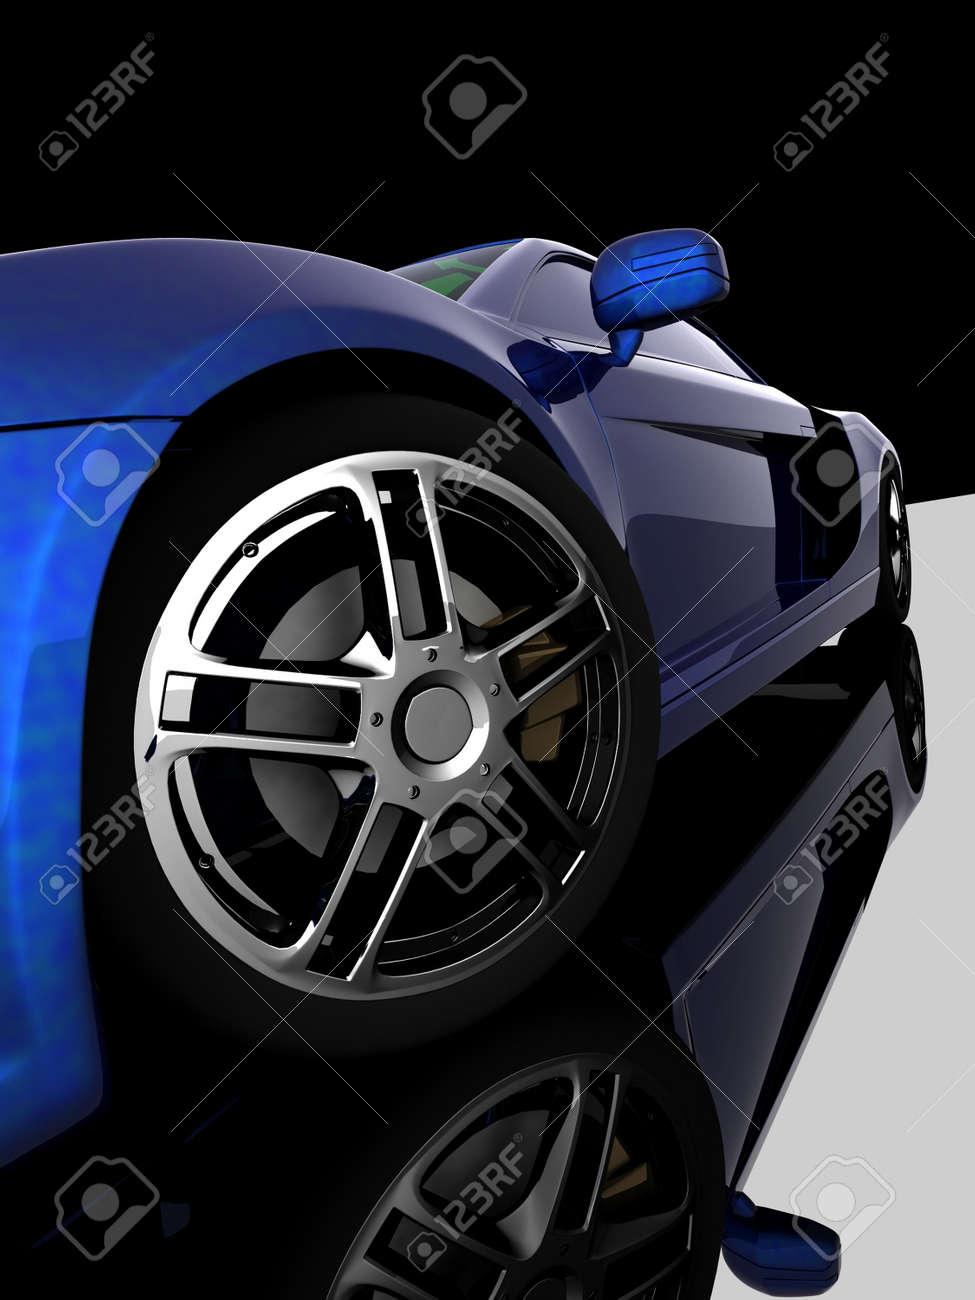 Closeup of wheels of machine on black background Stock Photo - 12800878